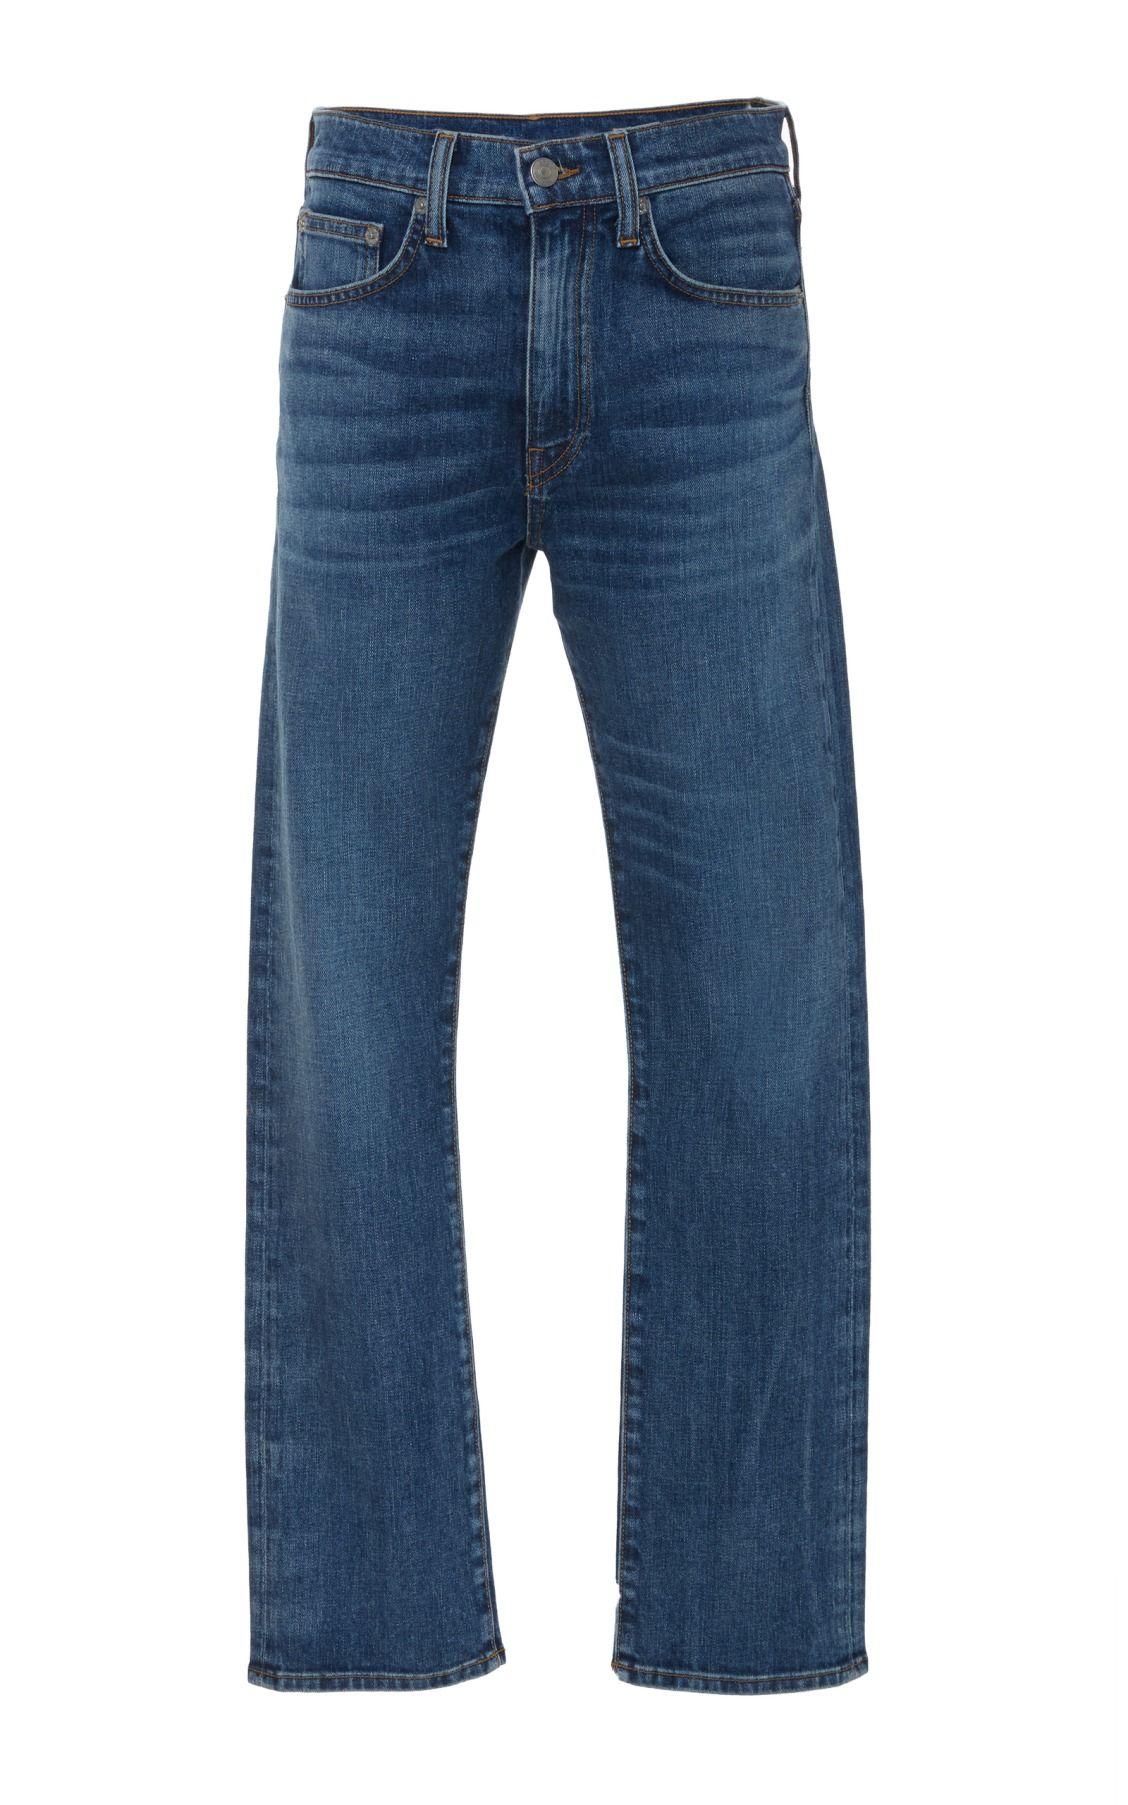 DENIM - Denim trousers Brock Collection Y3Ip9